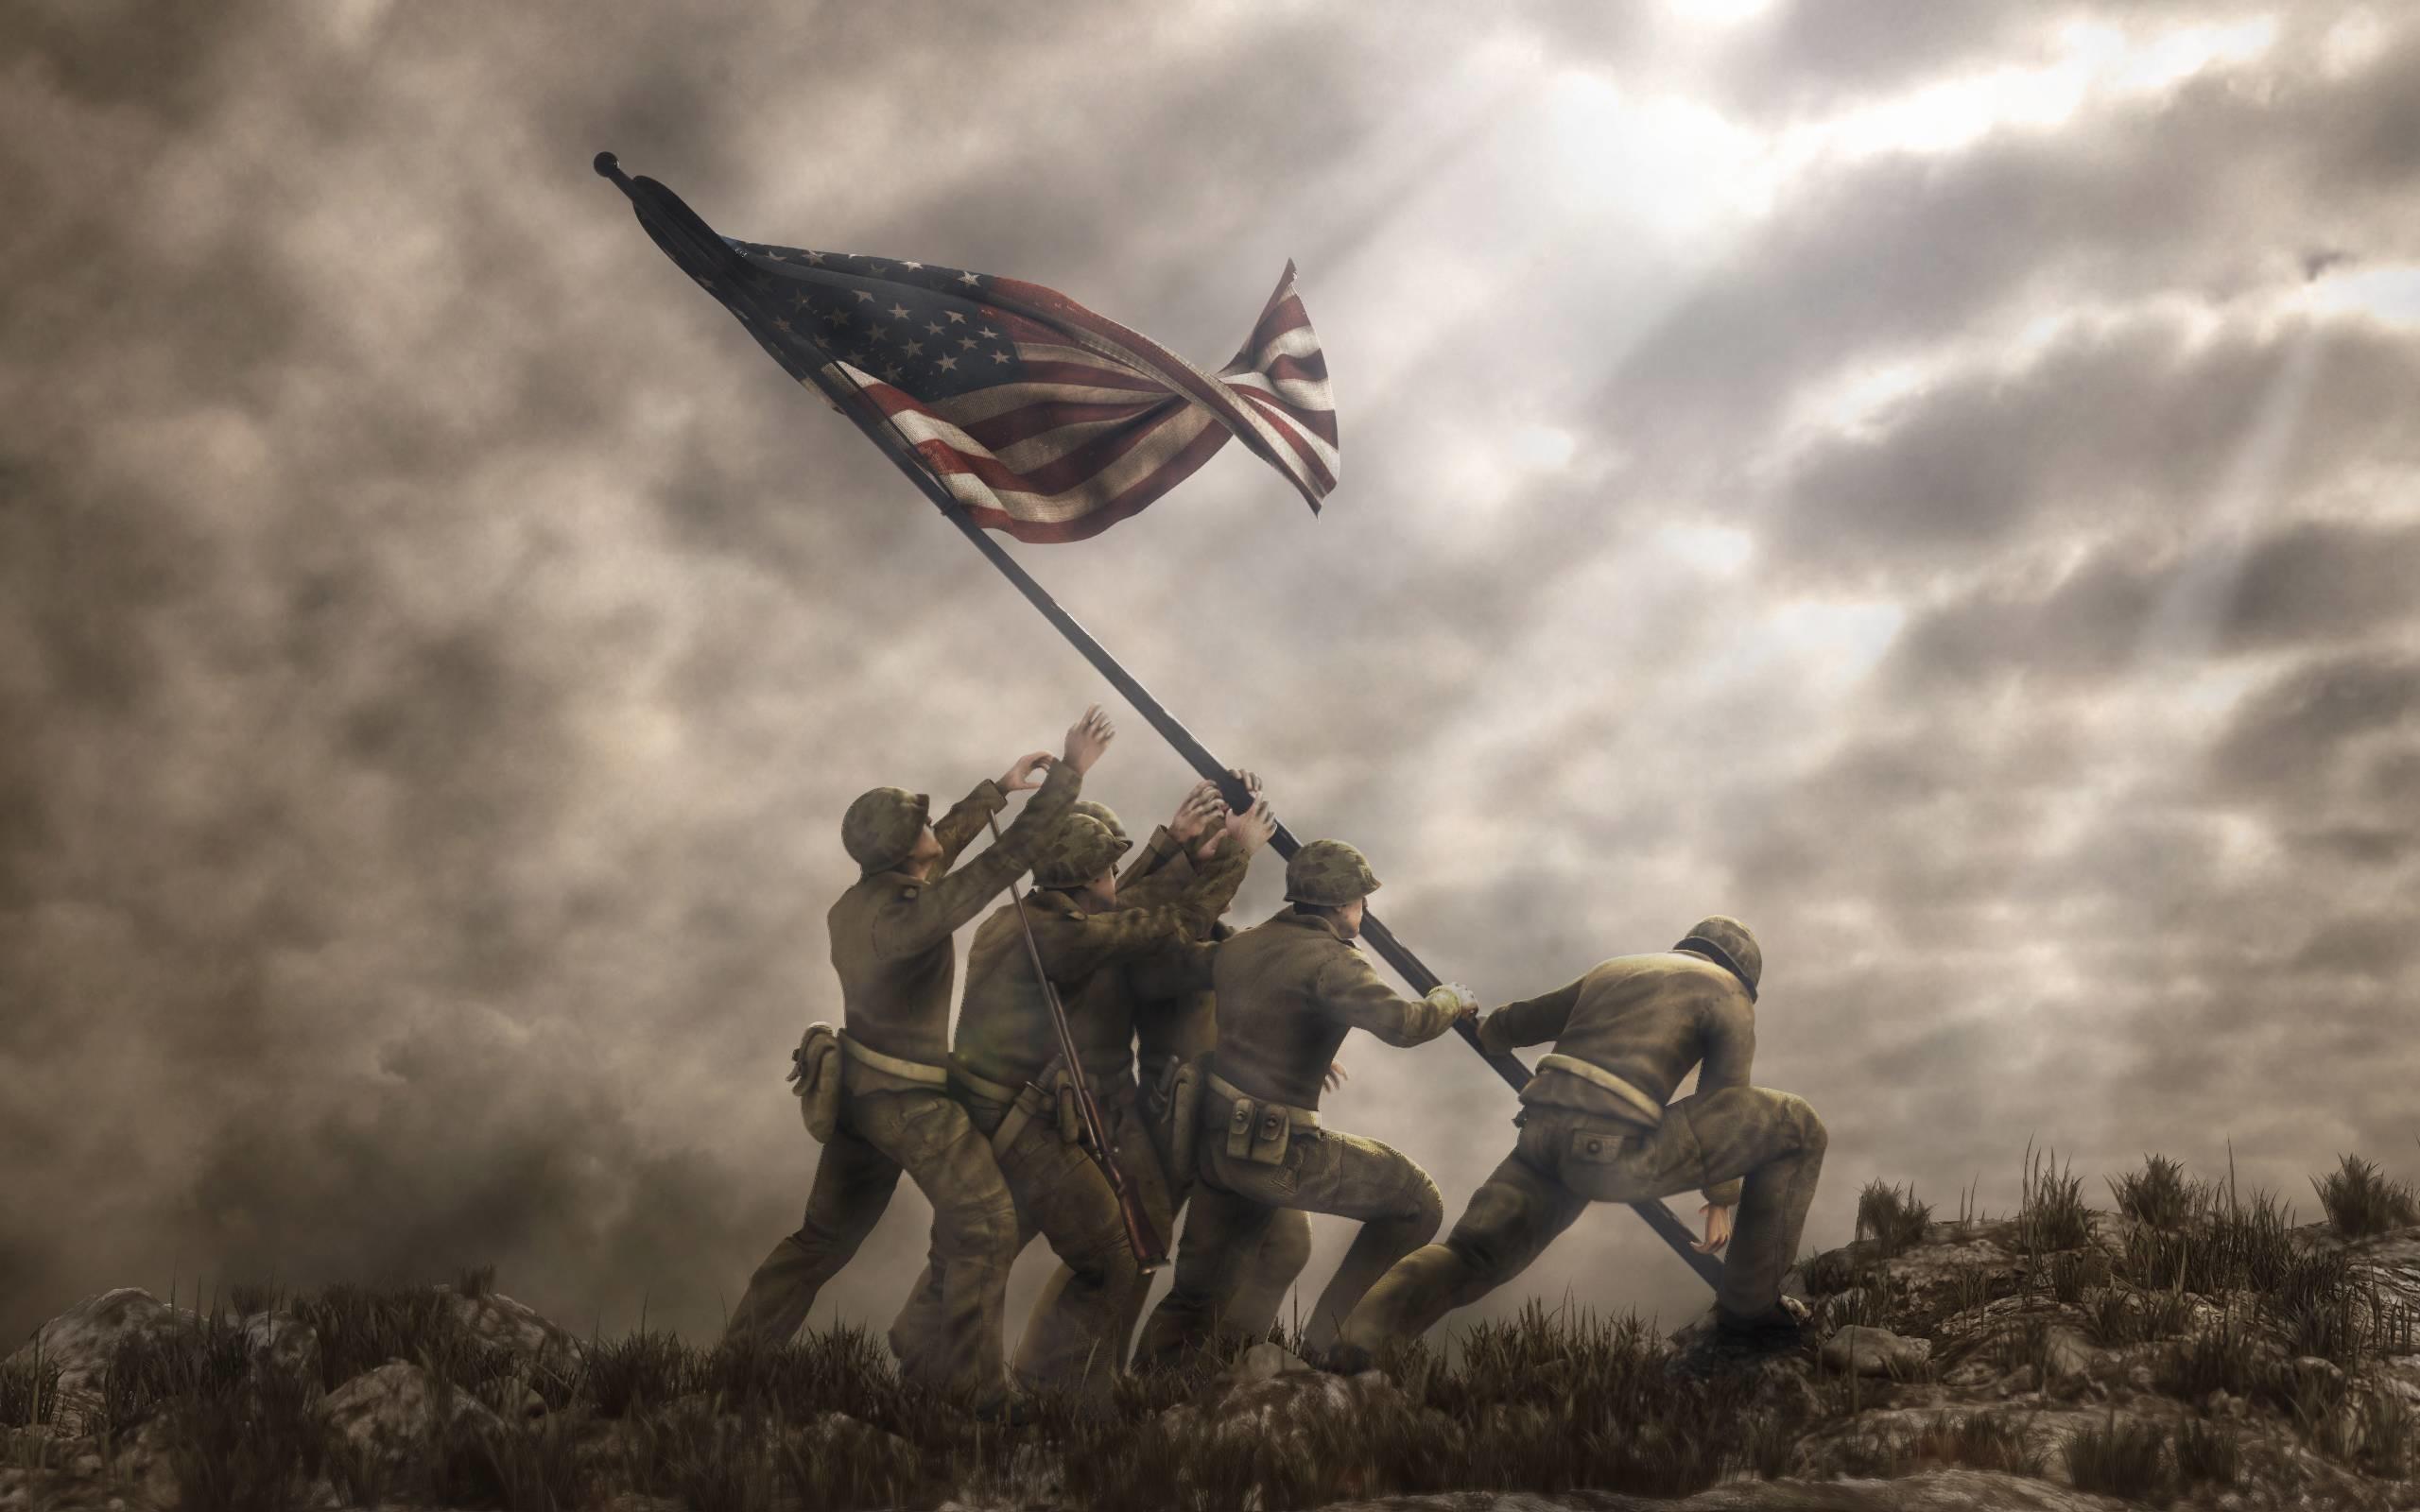 Iwo Jima Flag Raising Wallpapers – Wallpaper Cave